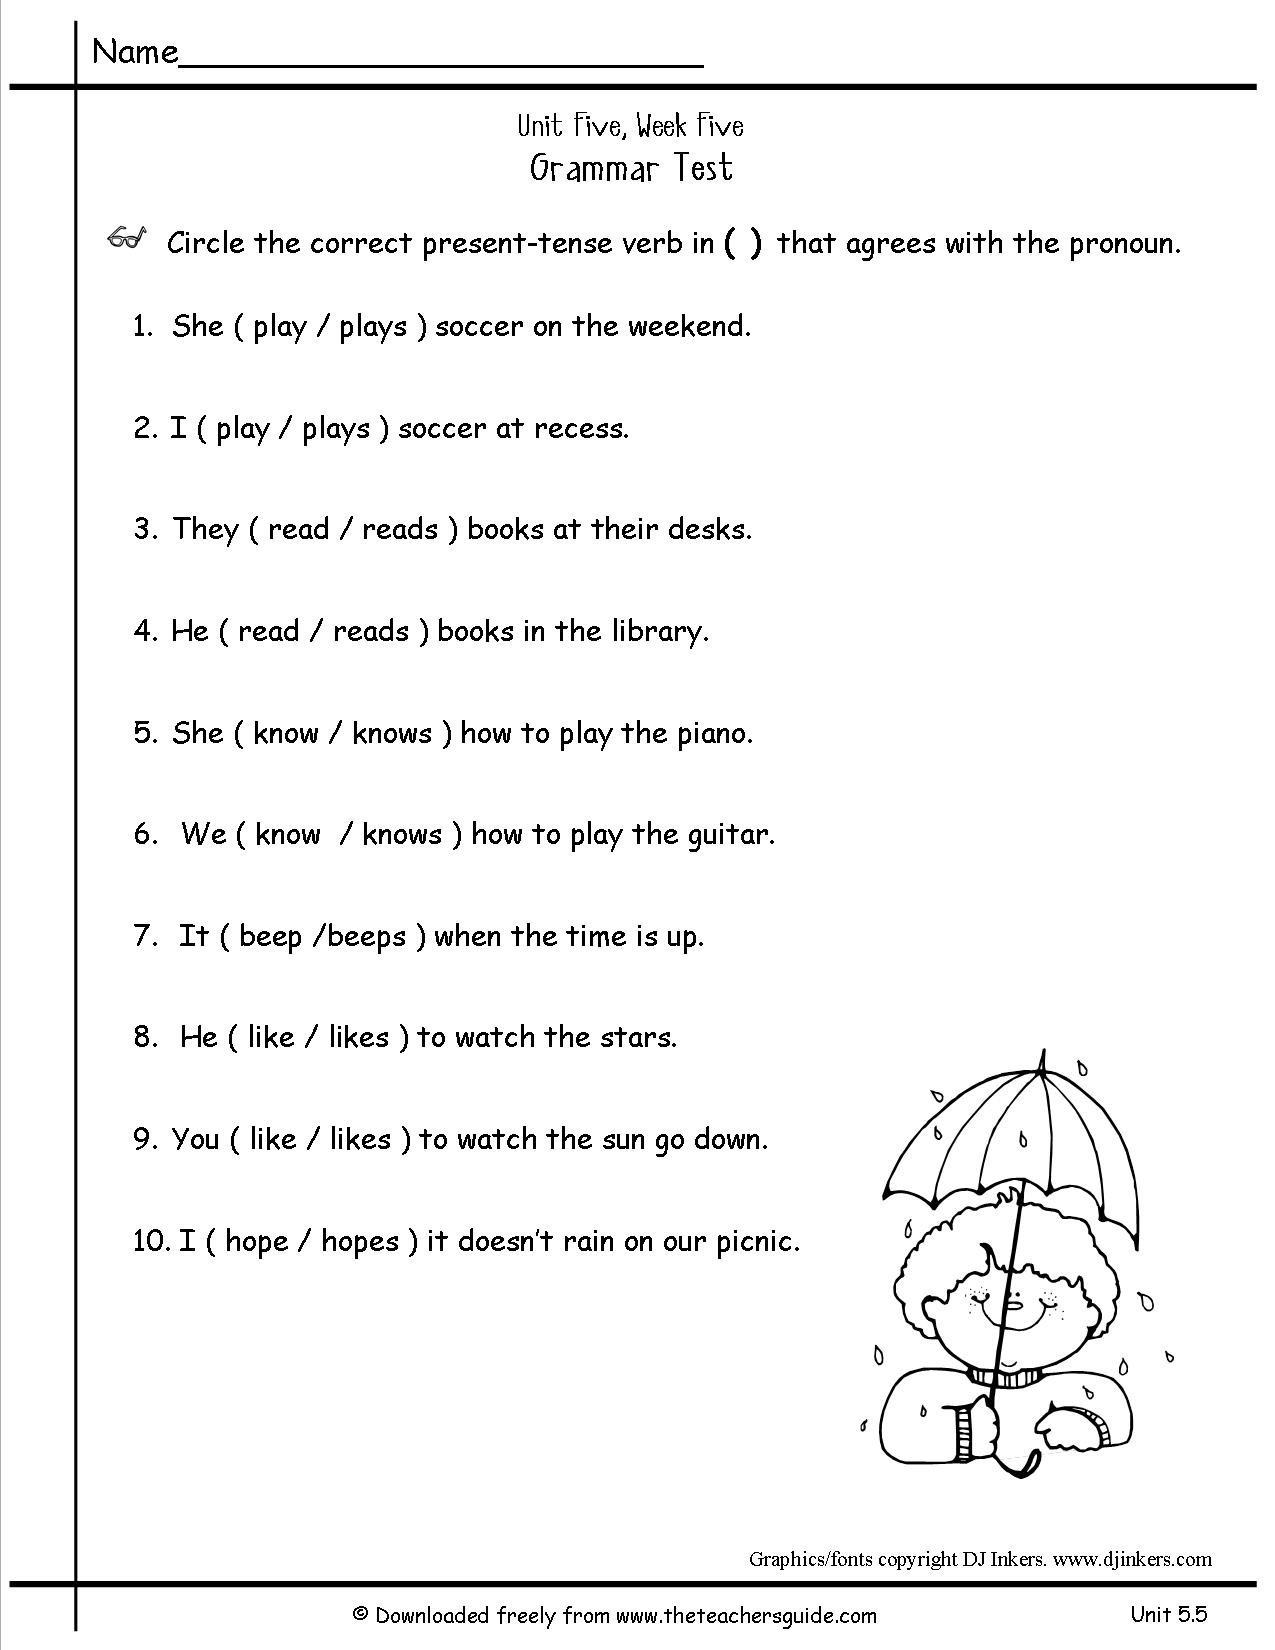 30 Pronoun Verb Agreement Worksheet